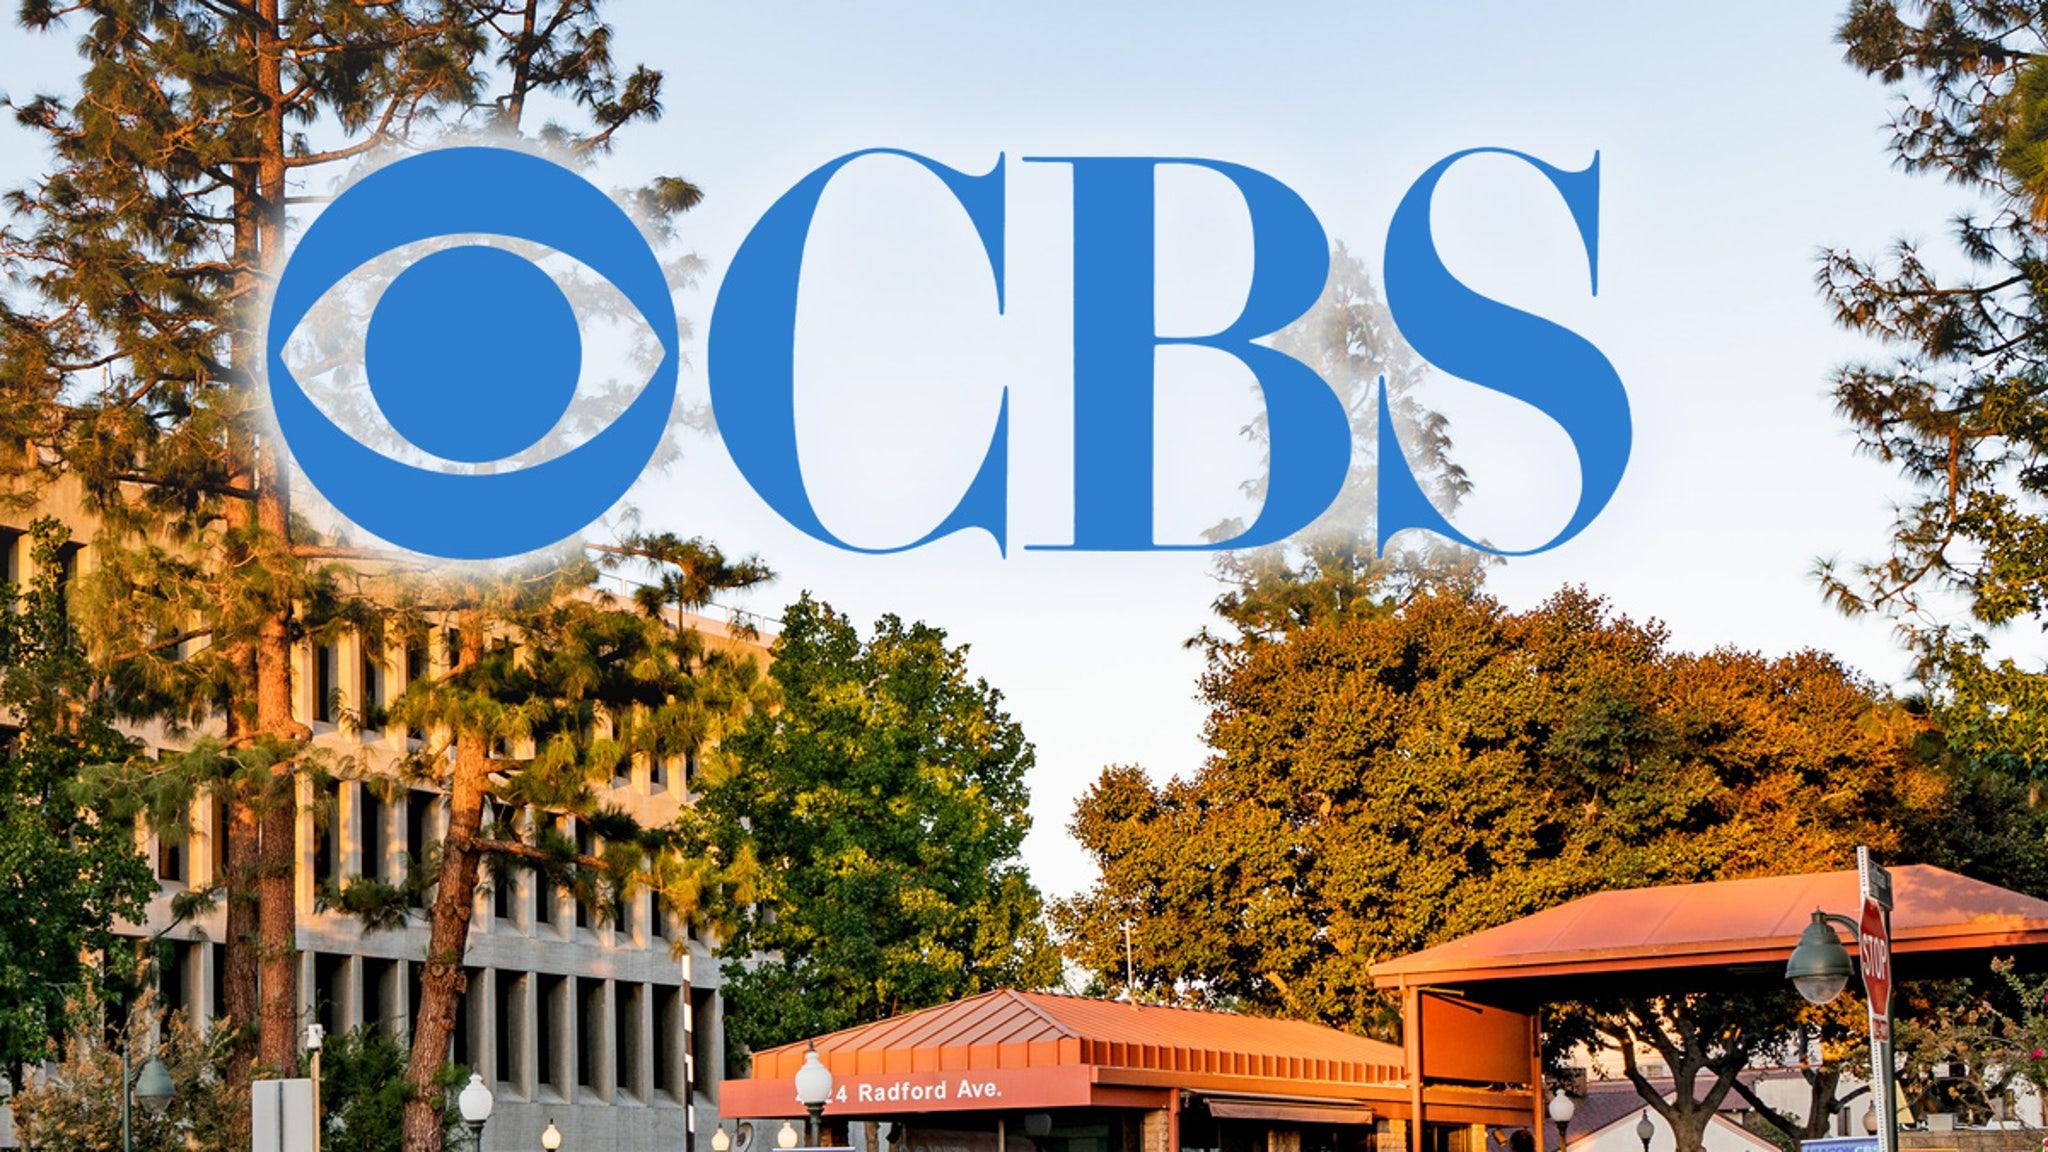 CBS Studios Employee Hospitalized After Huge Set Wall Falls on Him - TMZ